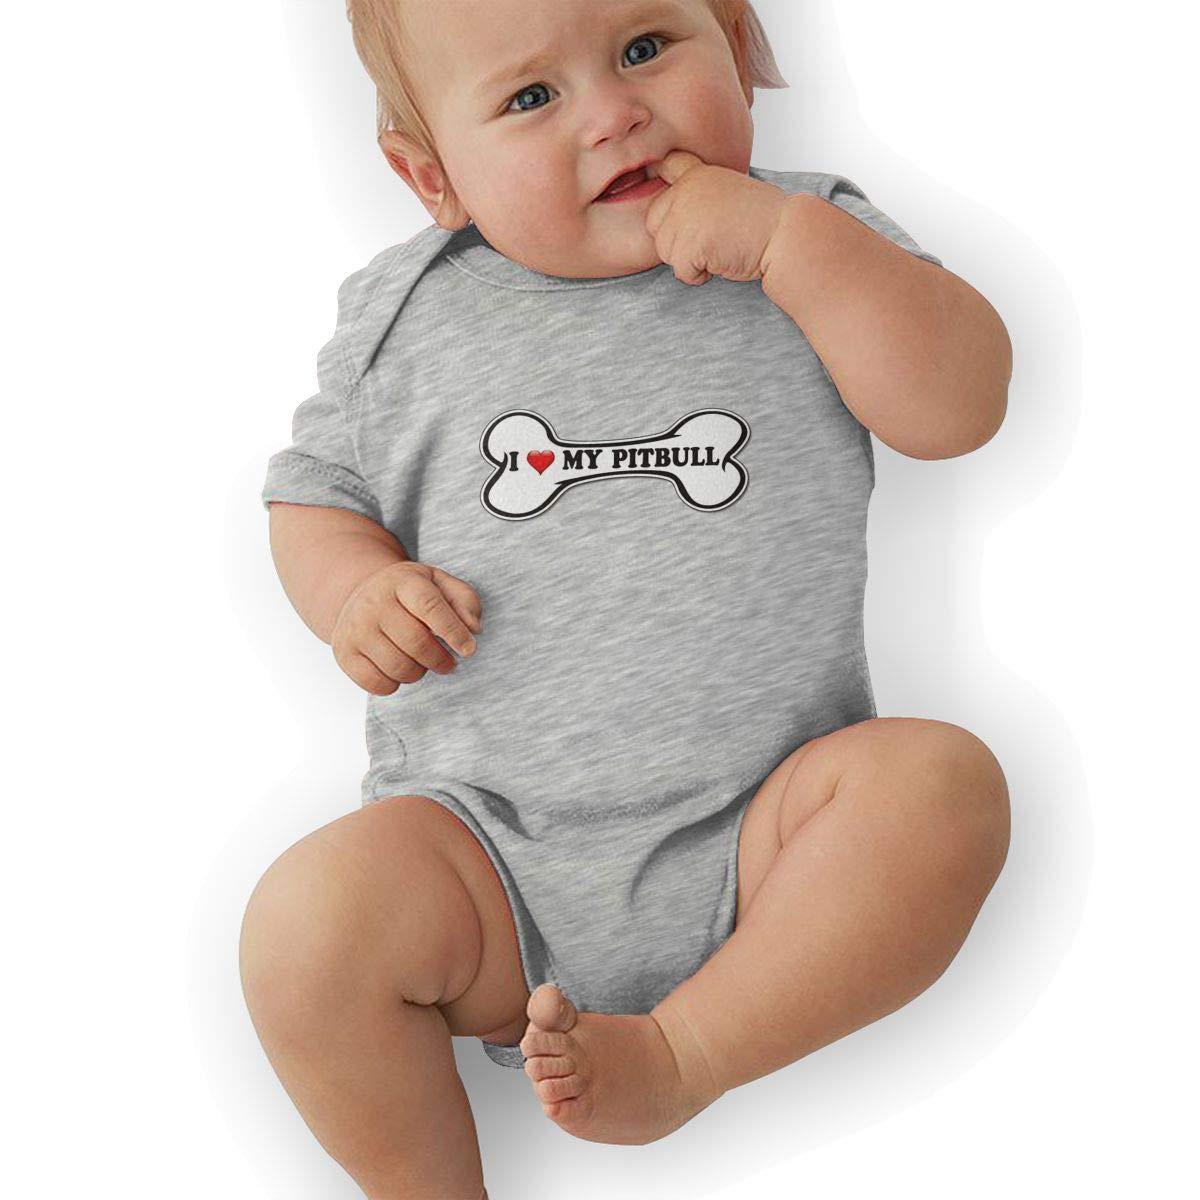 Infant Baby Girls Bodysuit Short-Sleeve Onesie I Love My Pitbull Print Outfit Autumn Pajamas